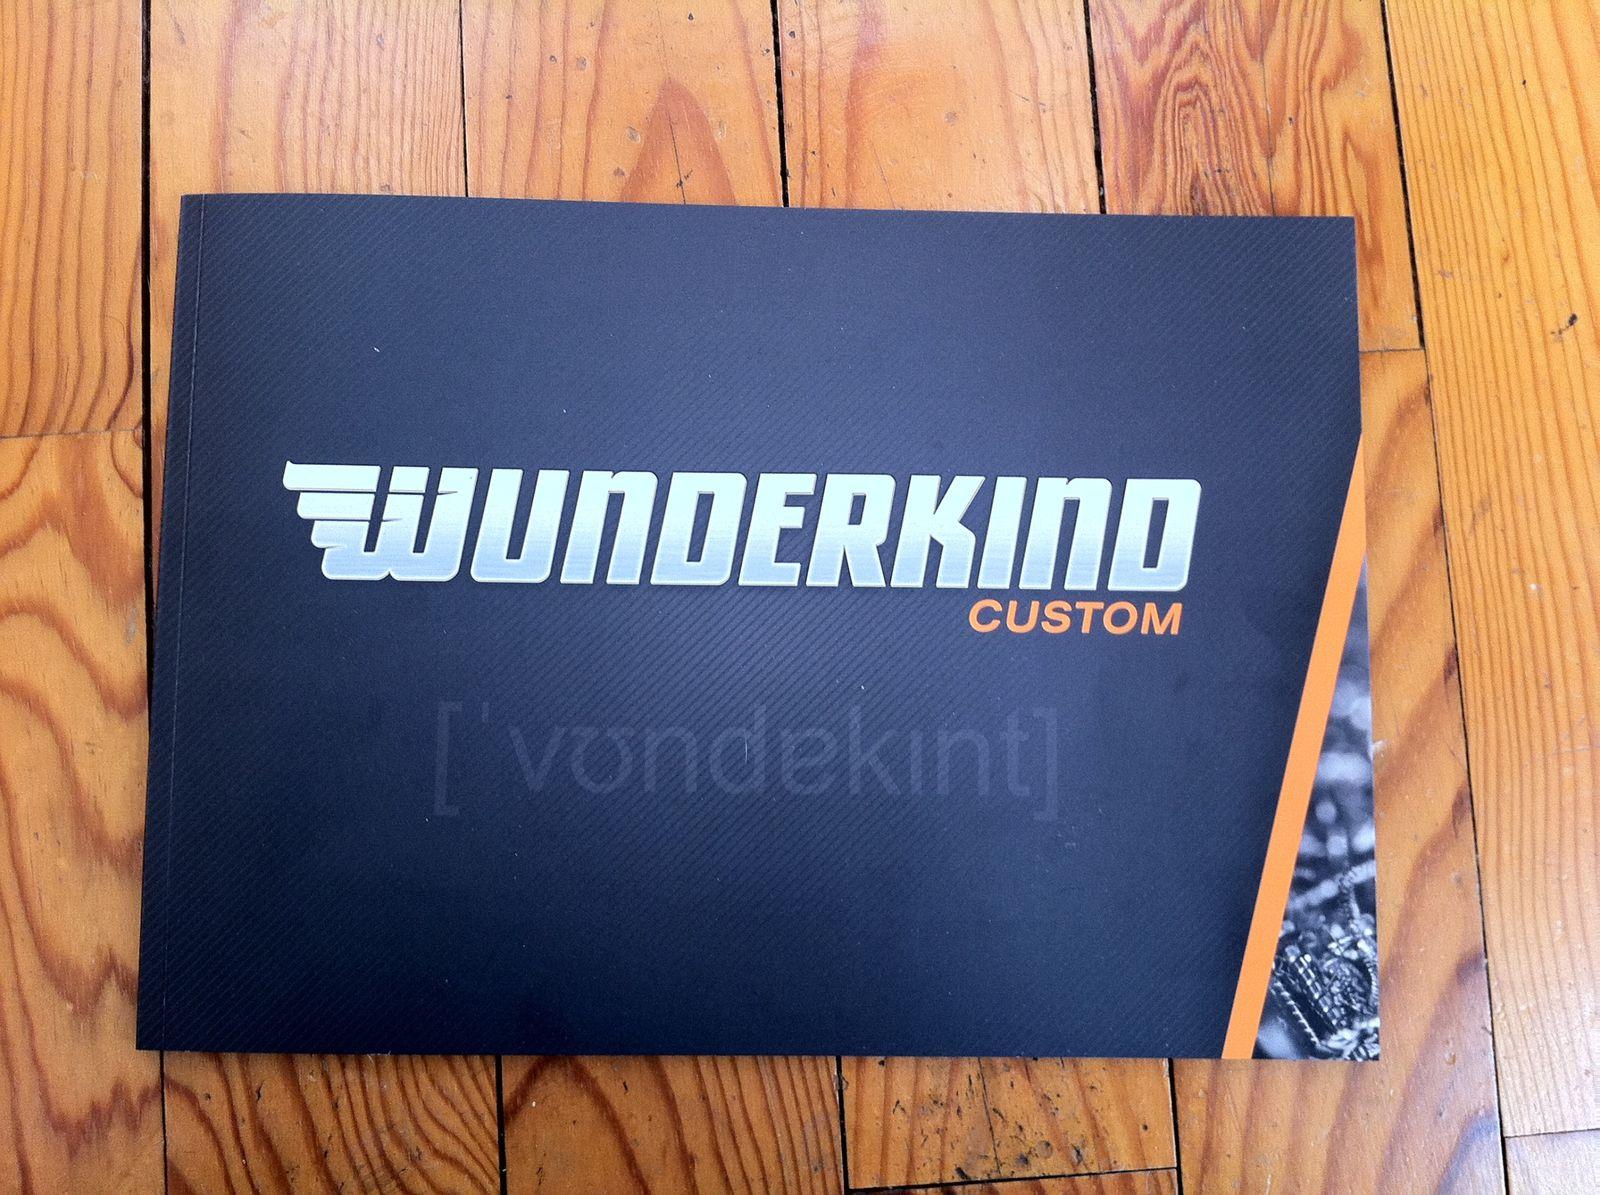 Wunderkind Custom  ABM un enfant prodige